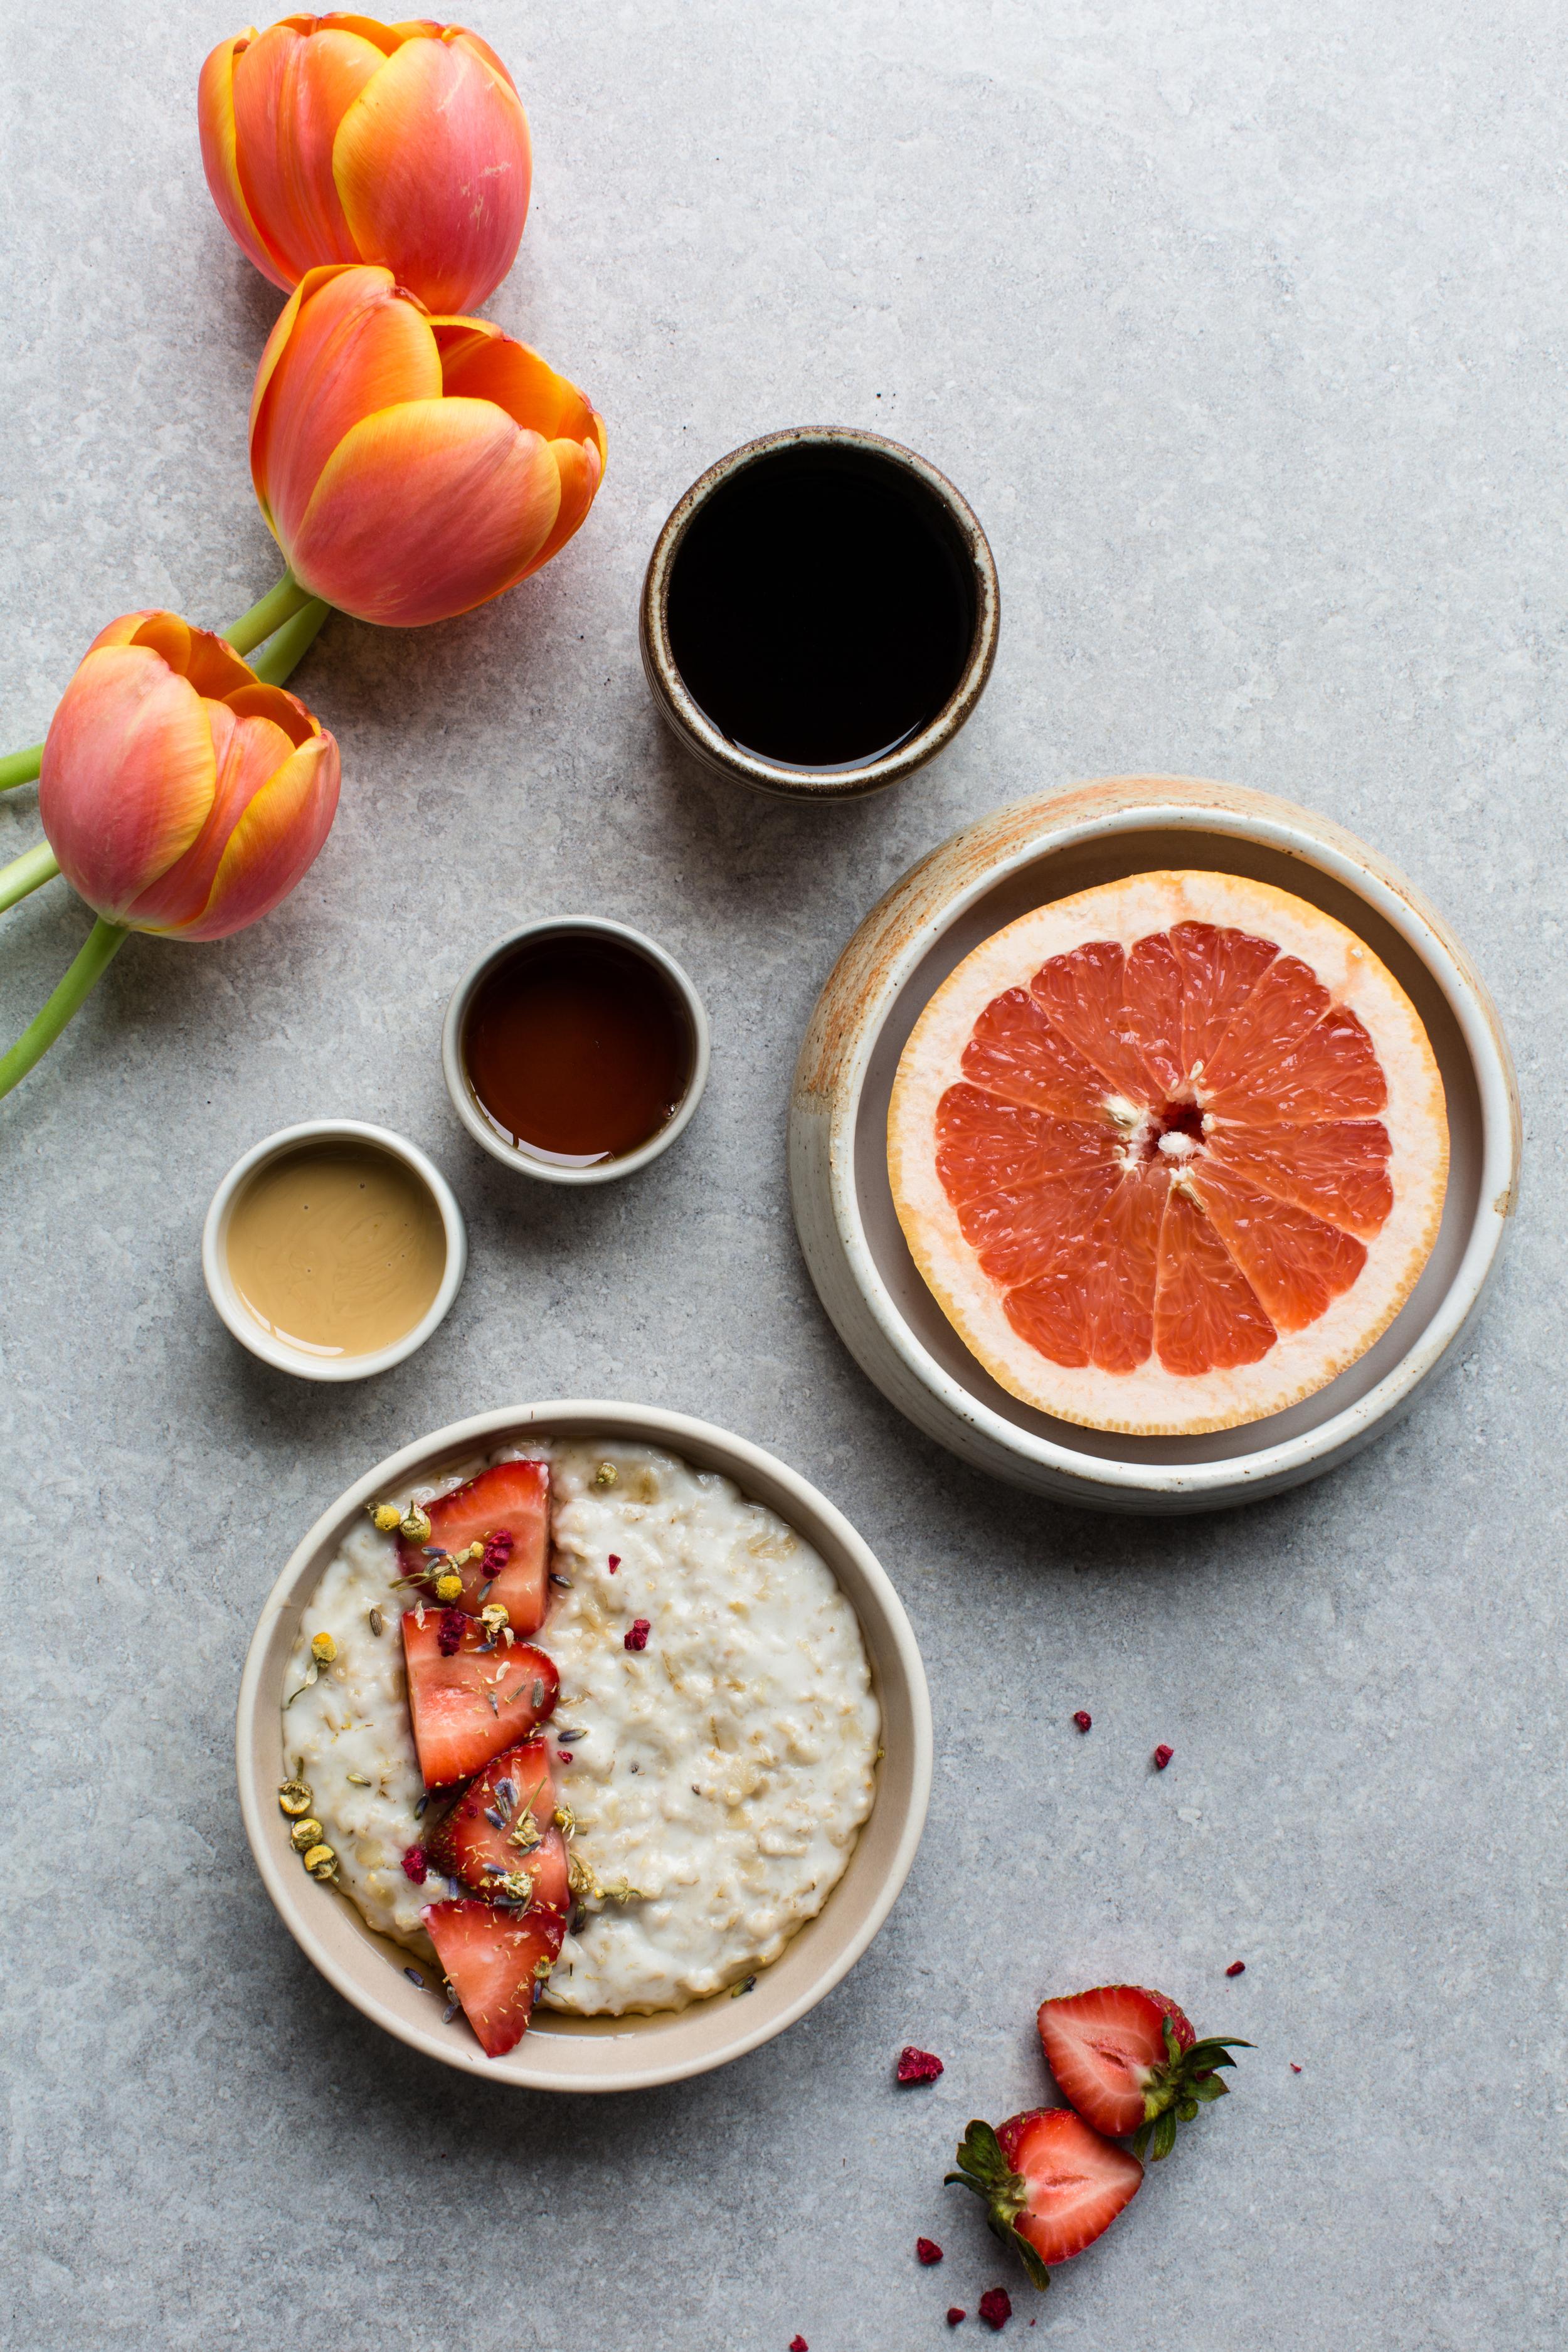 Maple-Tahini-Porridge-with-Vanilla | www.8thandlake.com